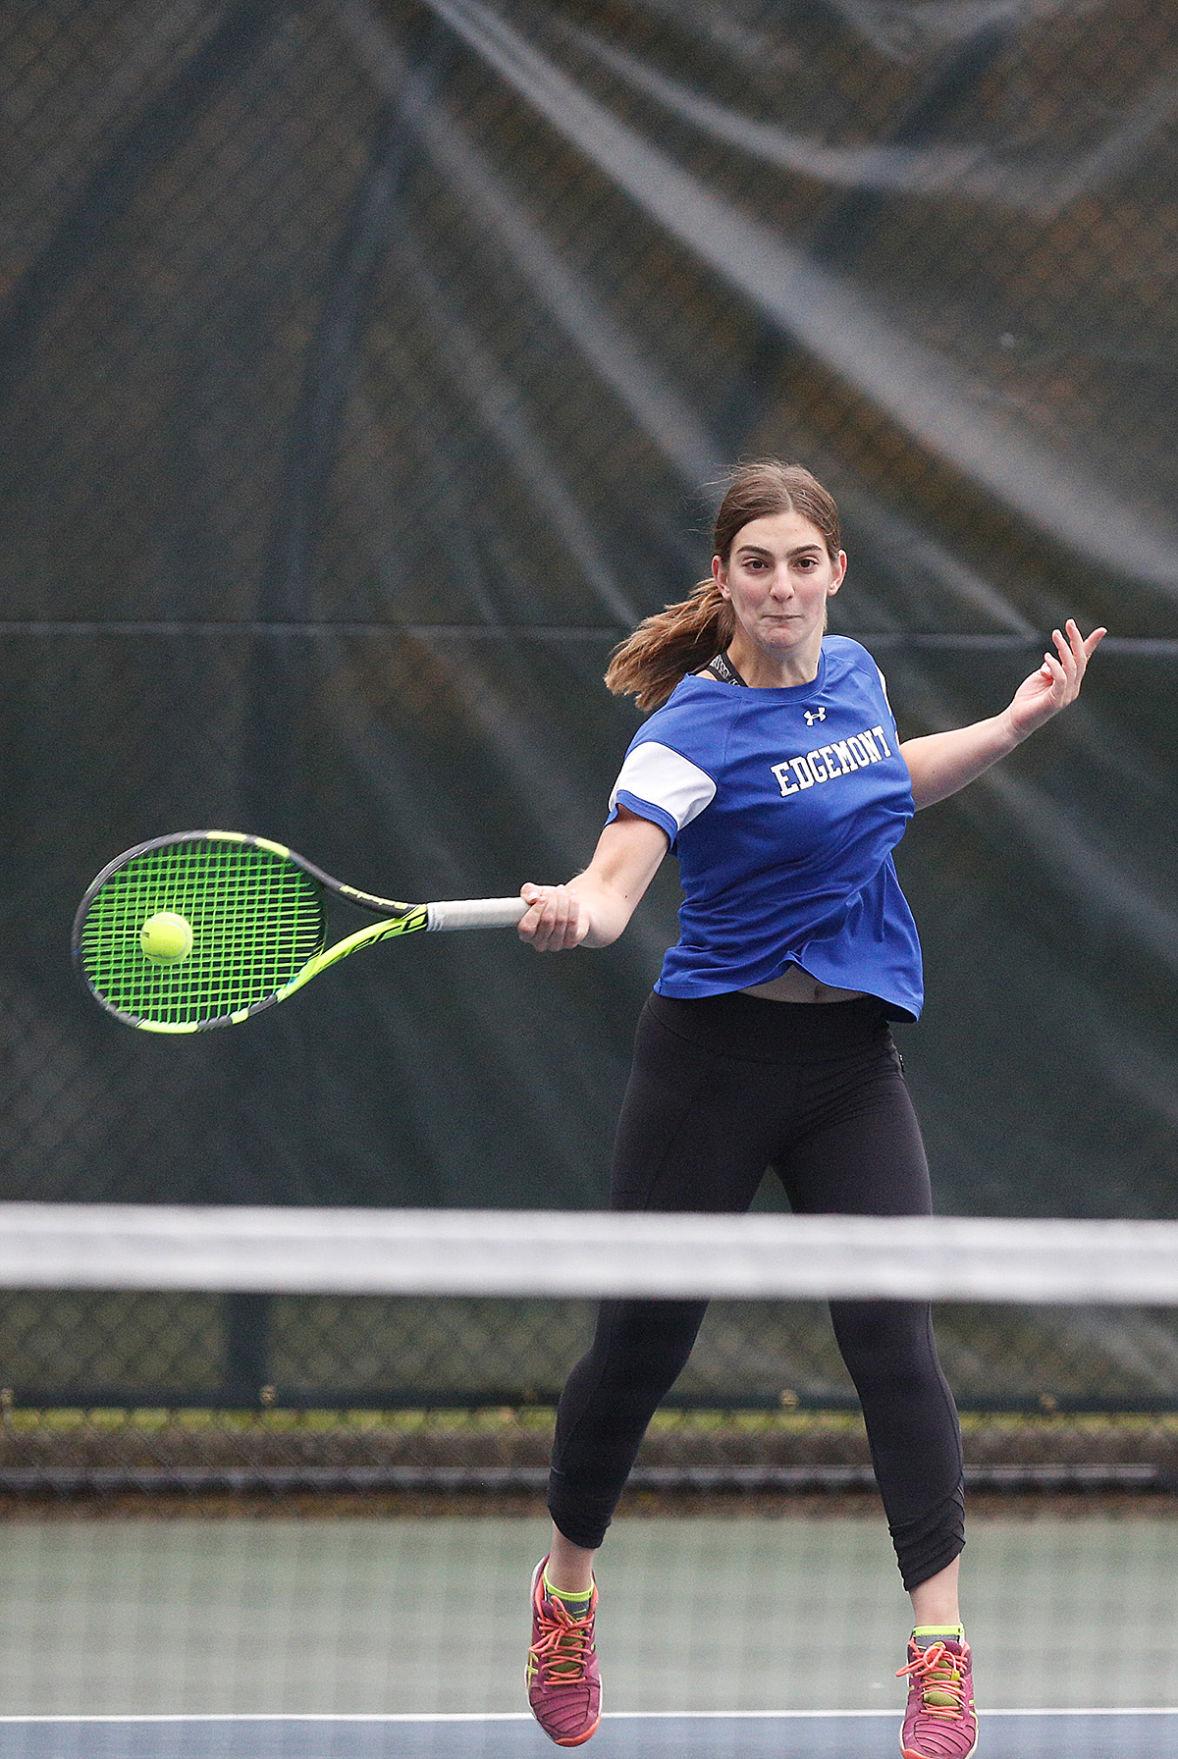 Edgemont tennis Zagorsky photo